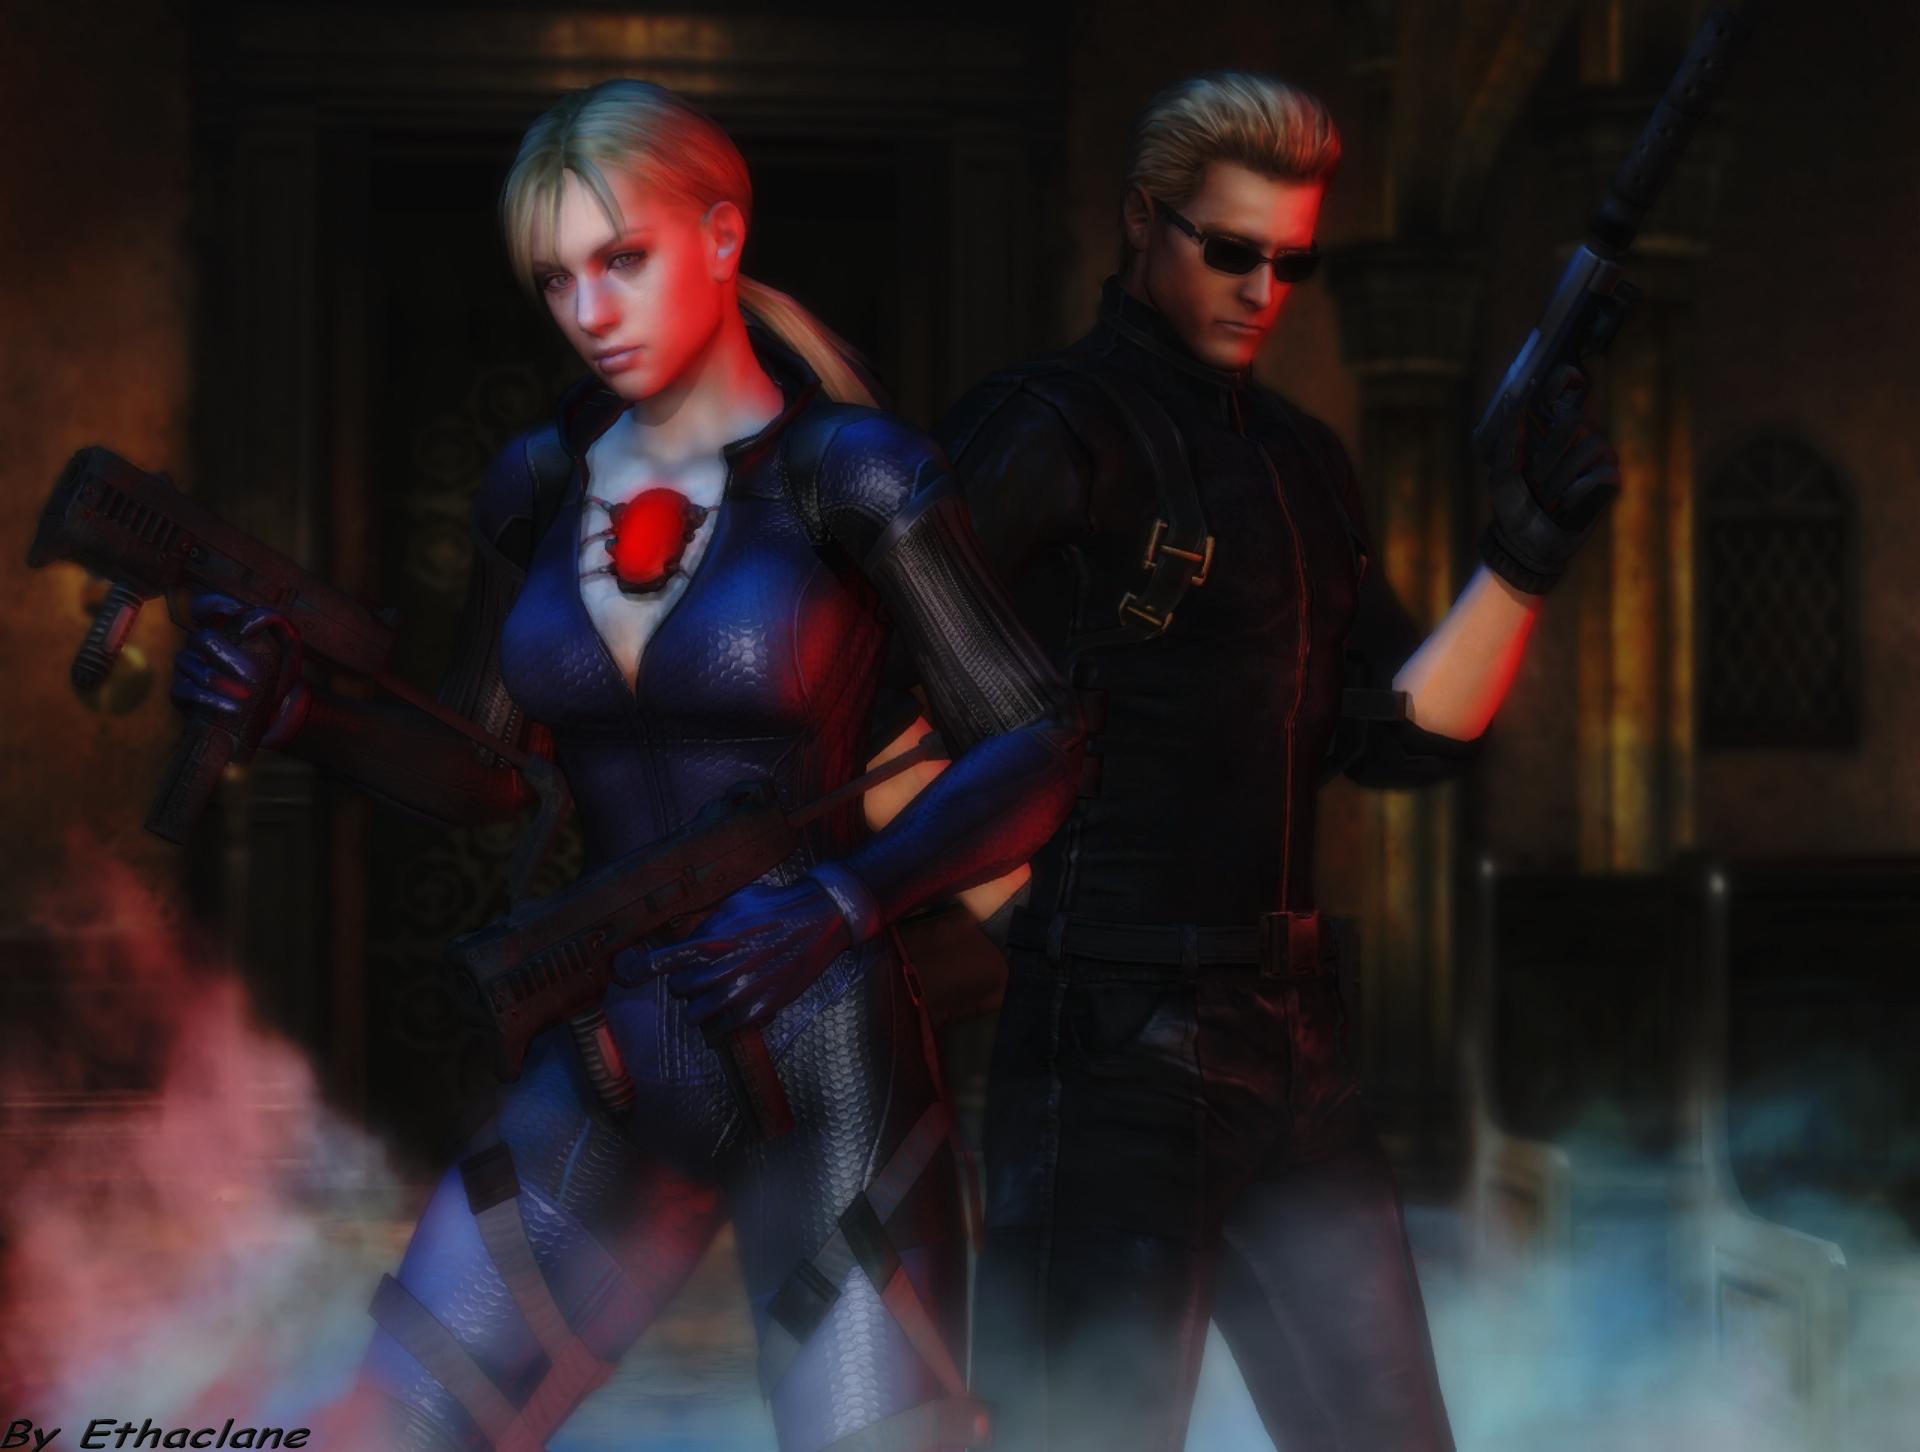 Resident Evil Wallpaper Jill And Wesker By Ethaclane On Deviantart